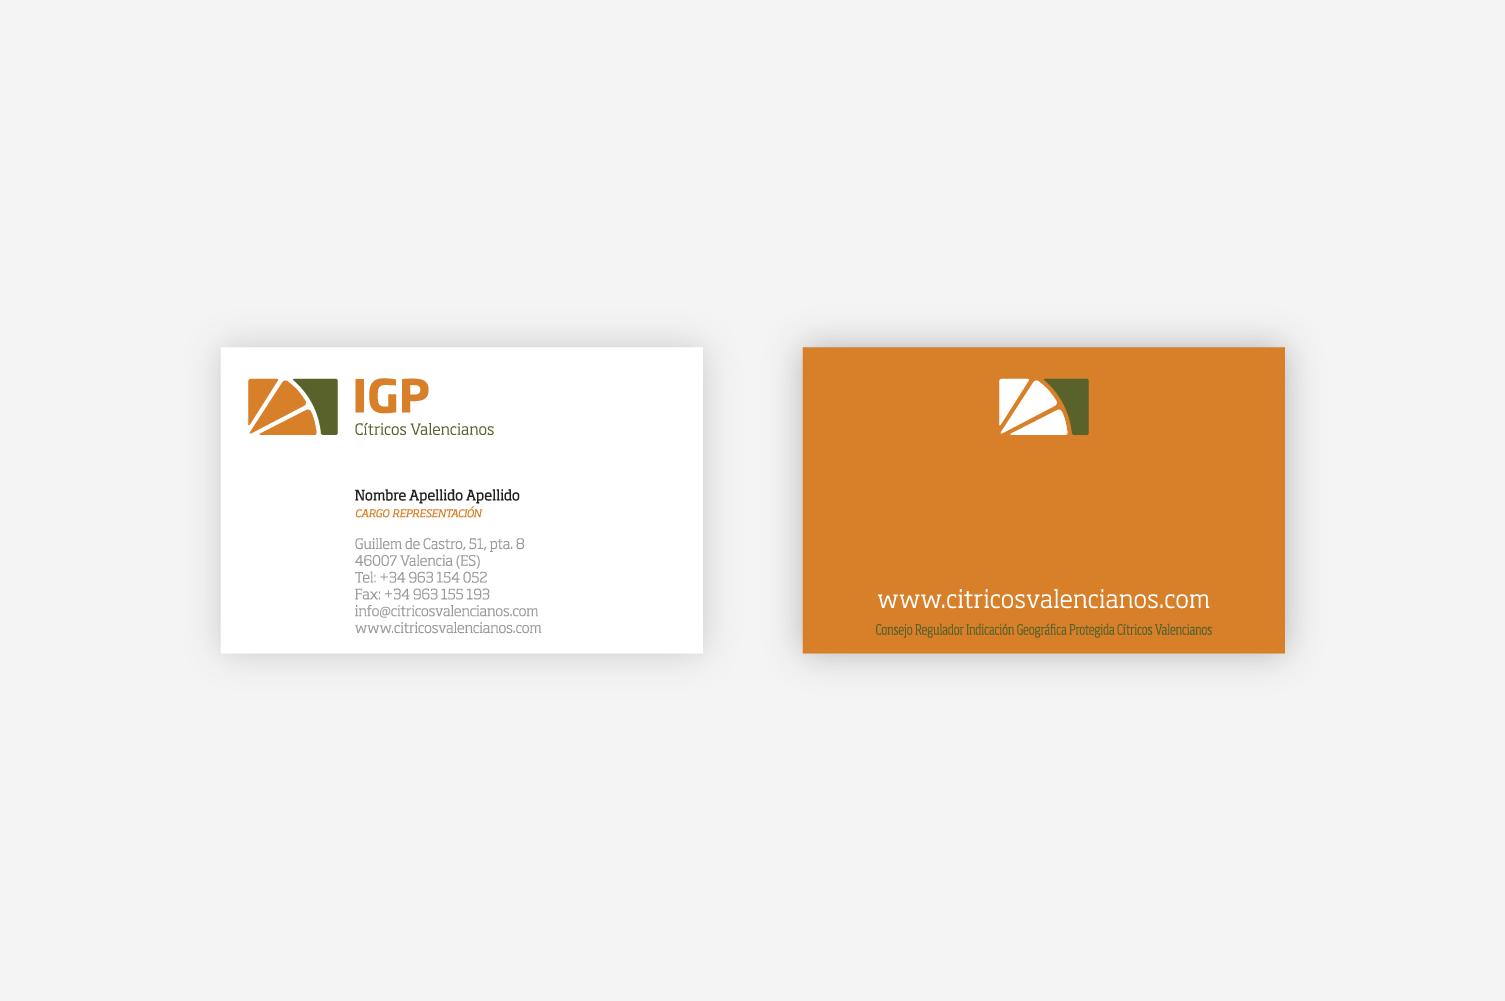 Manual de identidad corporativa IGP – Tarjetas